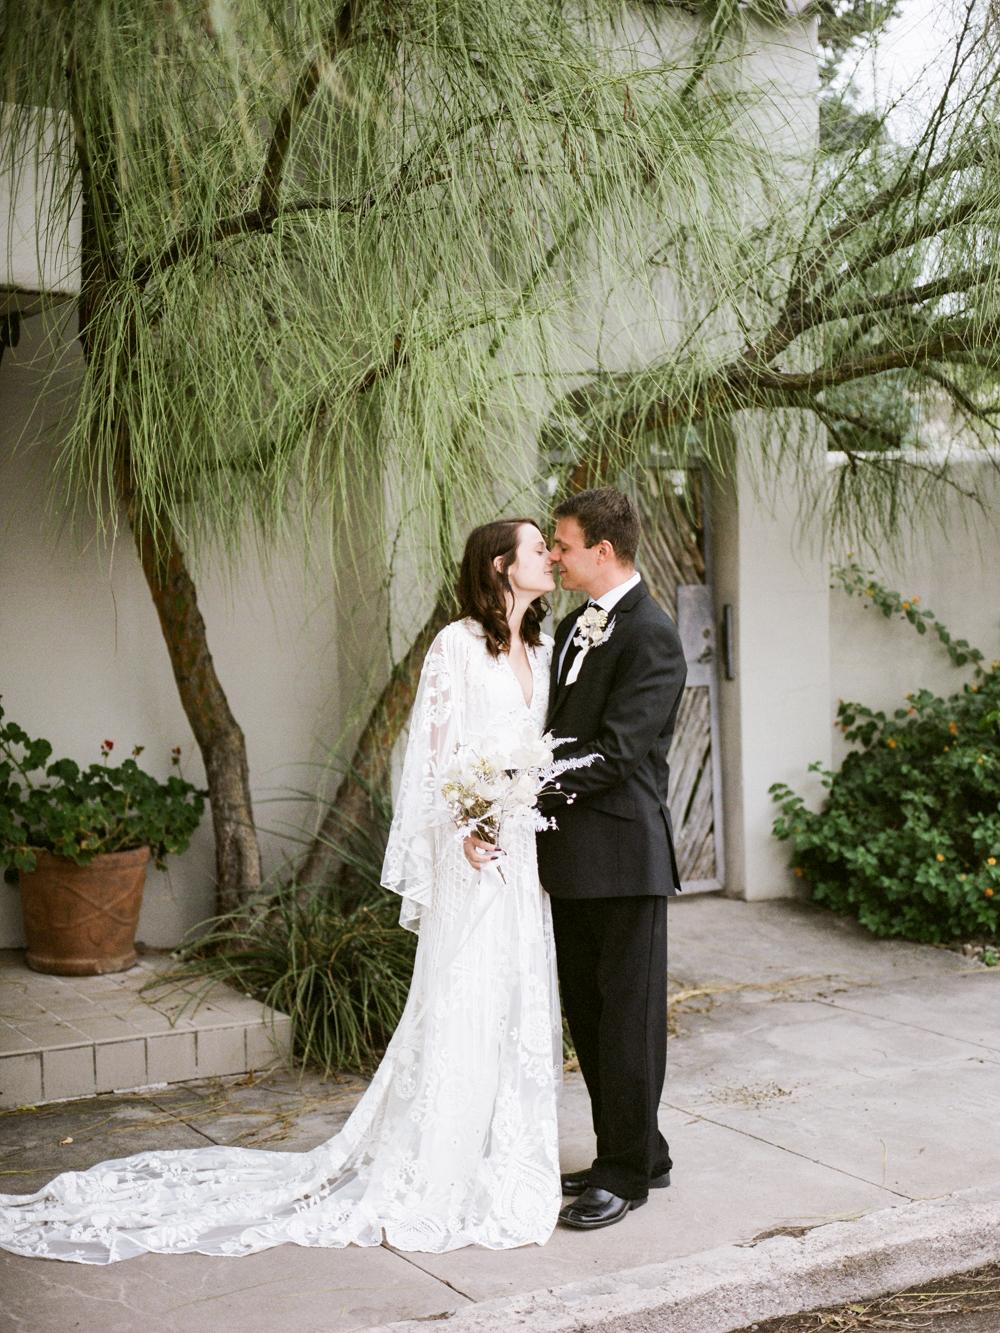 Marfa wedding photographer- destination wedding photographer-christine gosch - film photographer - elopement photographer-1.jpg